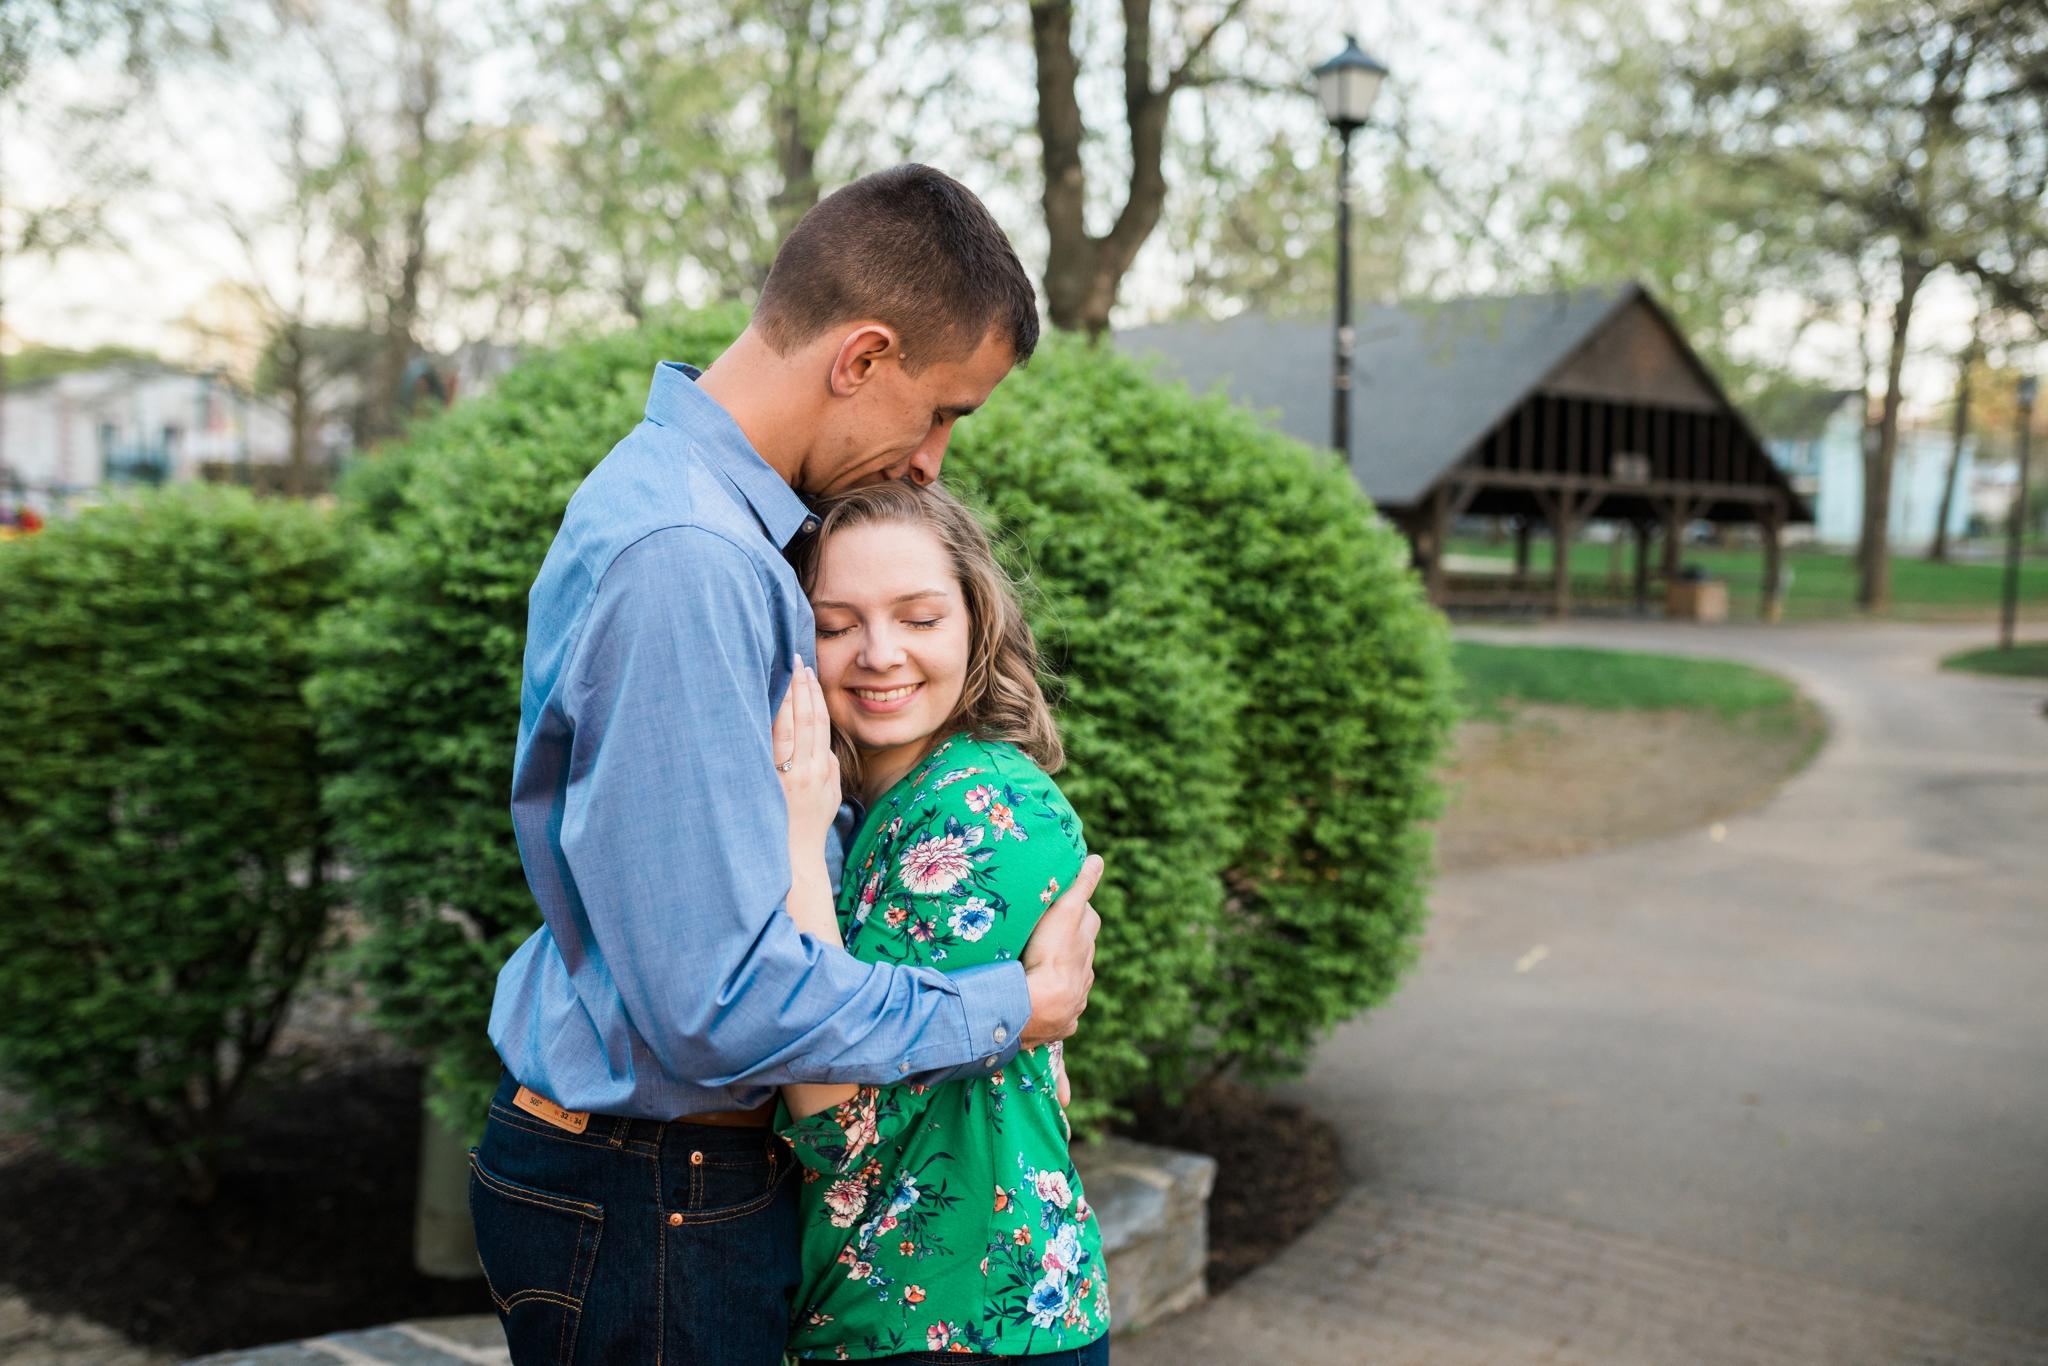 Emily Grace Photography, Lancaster PA Wedding Photograper for Non-Traditional Couples, Lititz Spring Park Engagement Photos